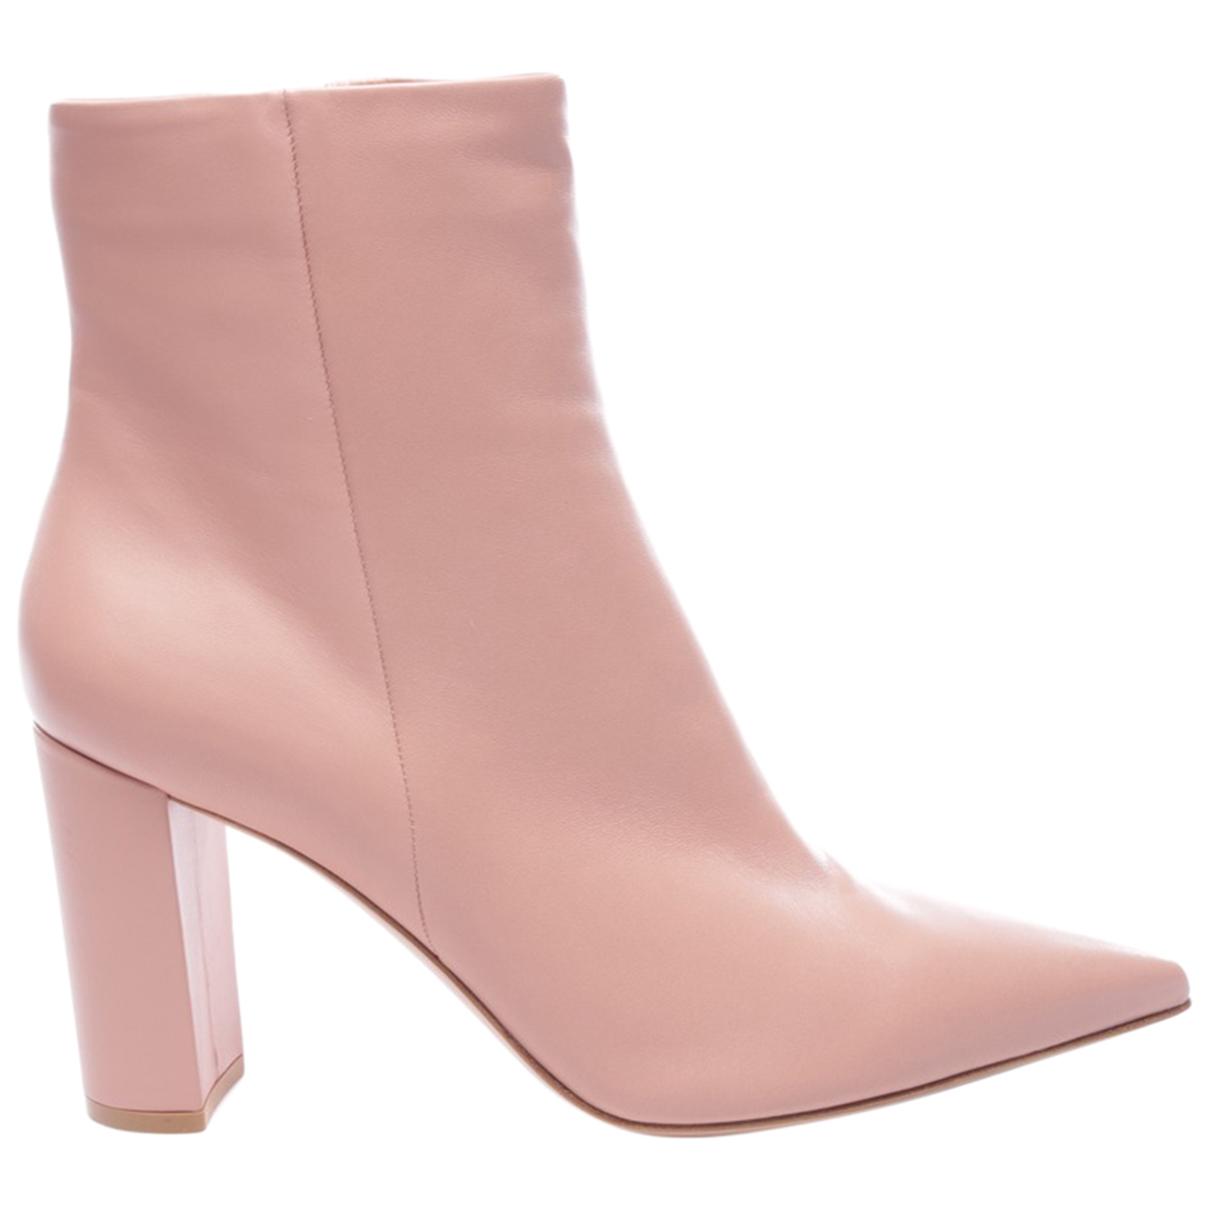 Gianvito Rossi - Boots   pour femme en cuir - rose